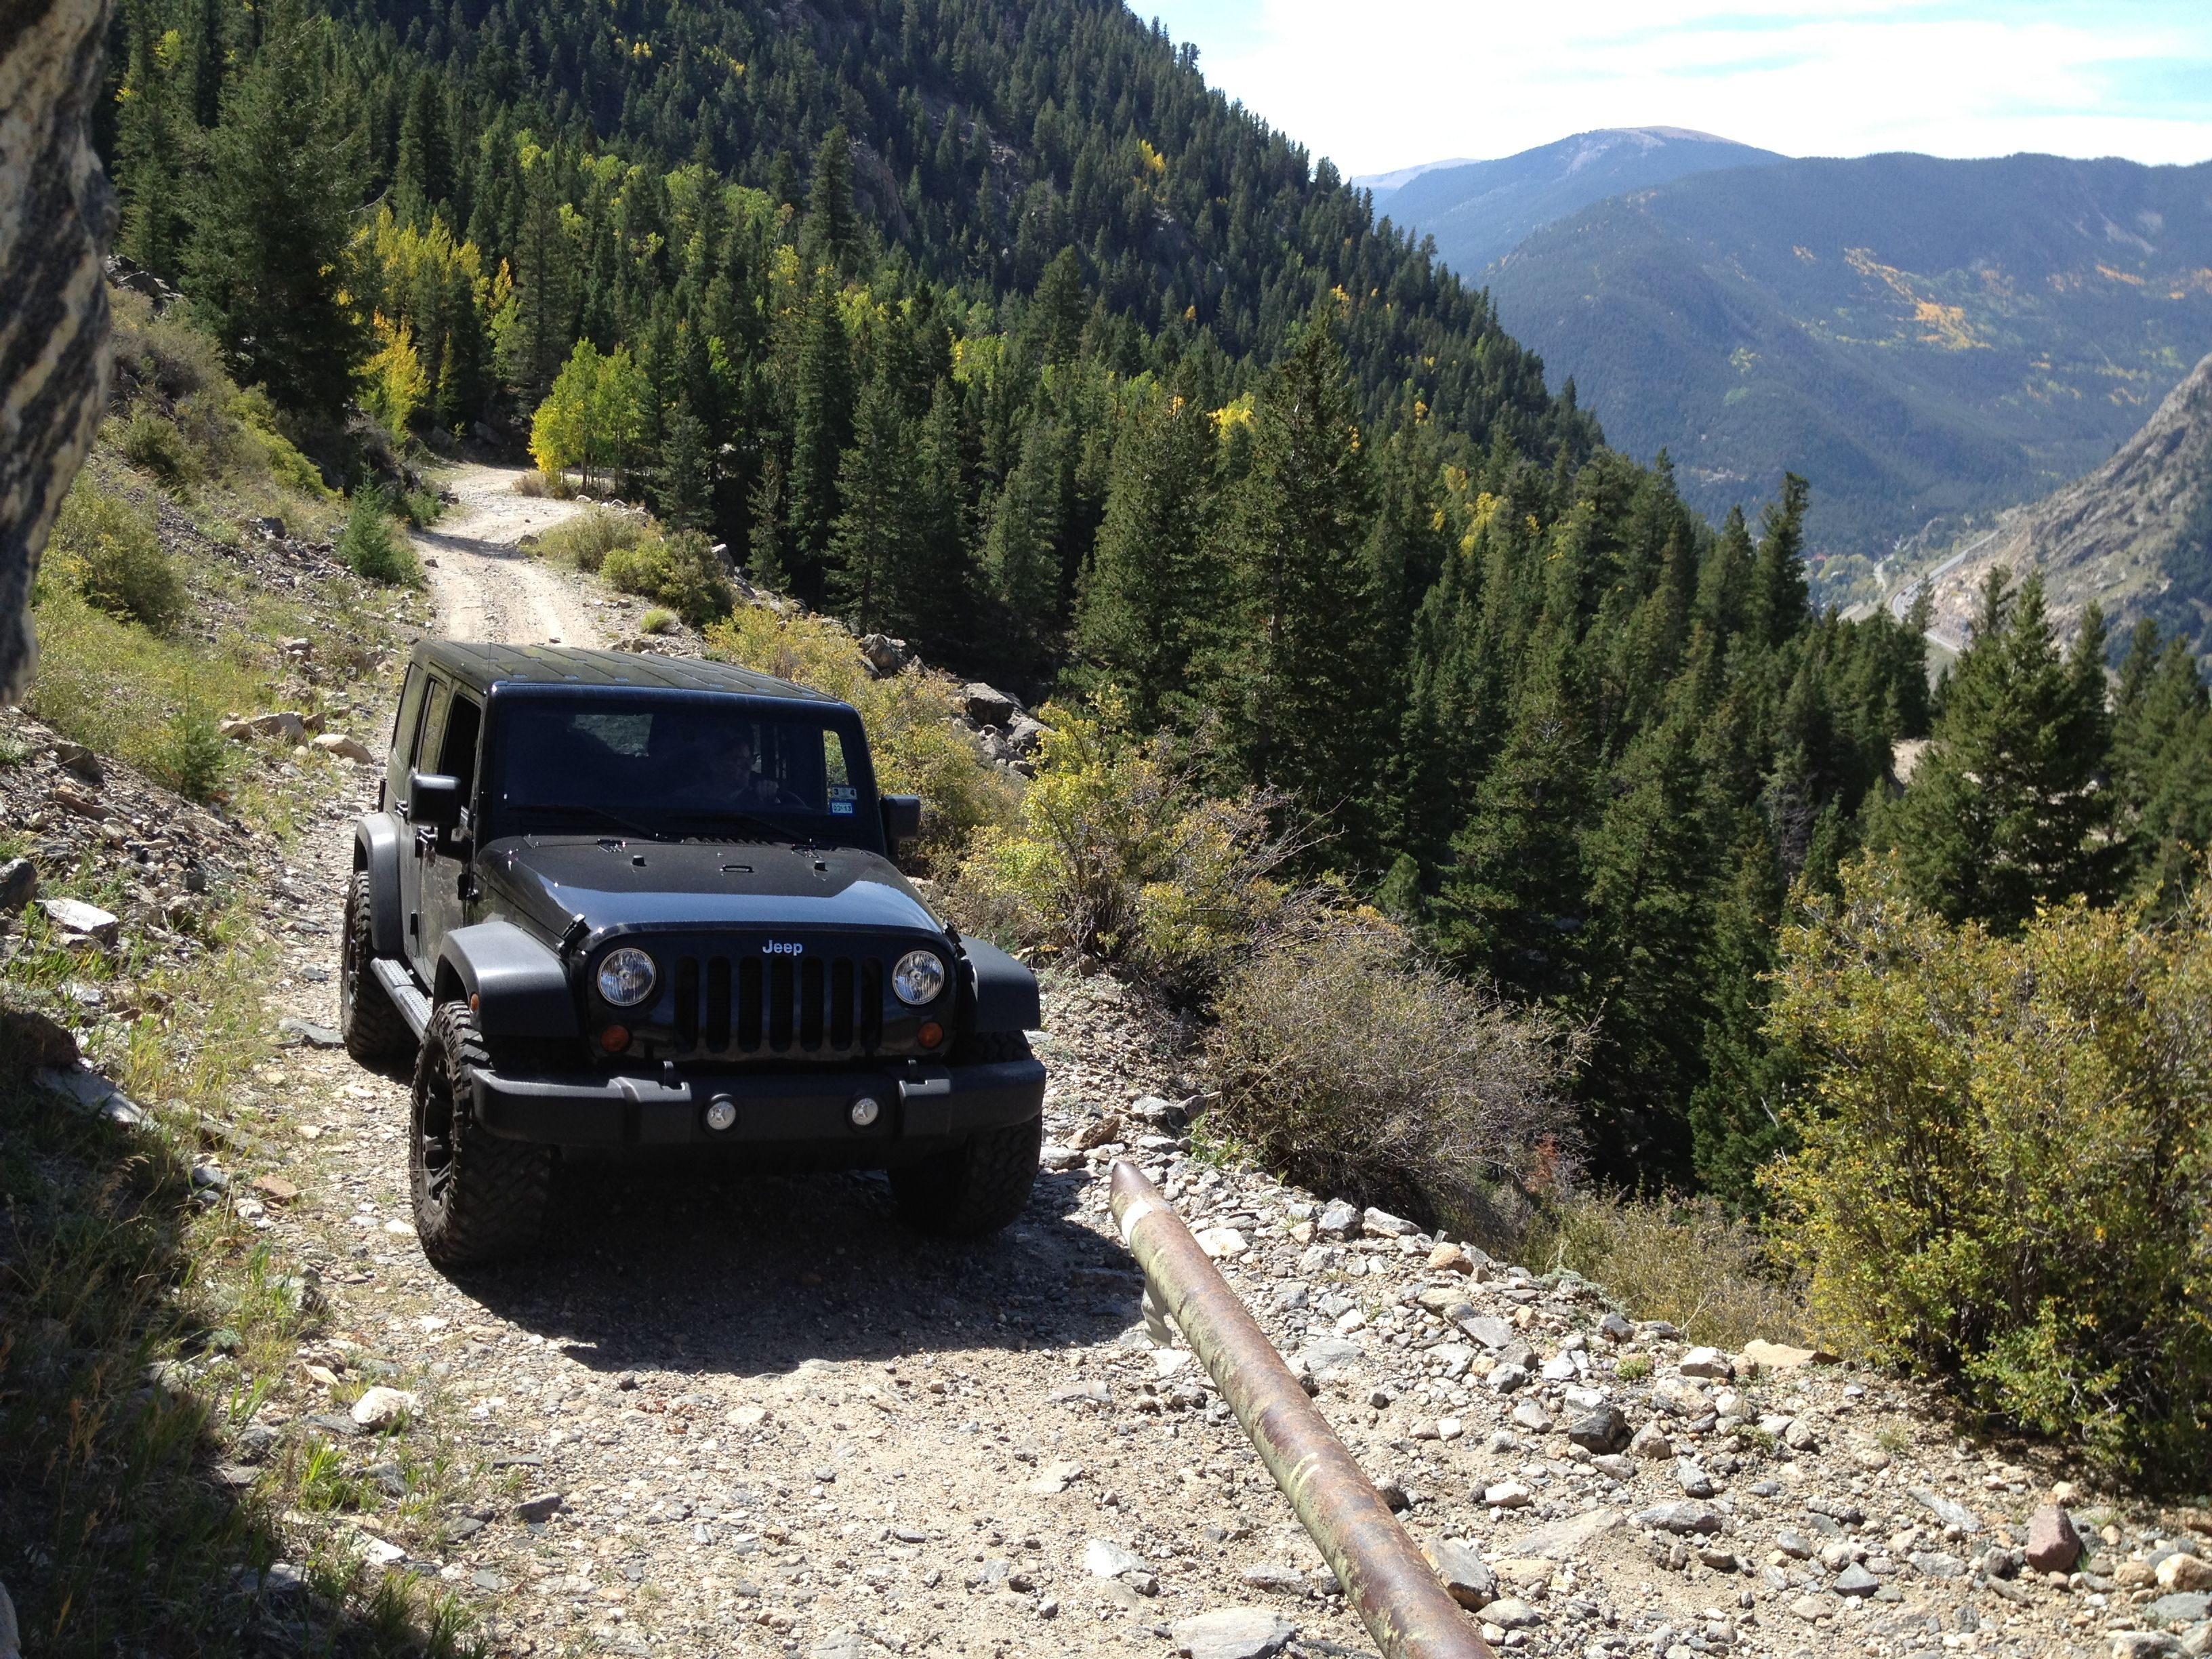 Saxon Mountain Jeep Trail The Evergreen Colorado Experience Jeep Trails Car Wheels Diy Car Wheels